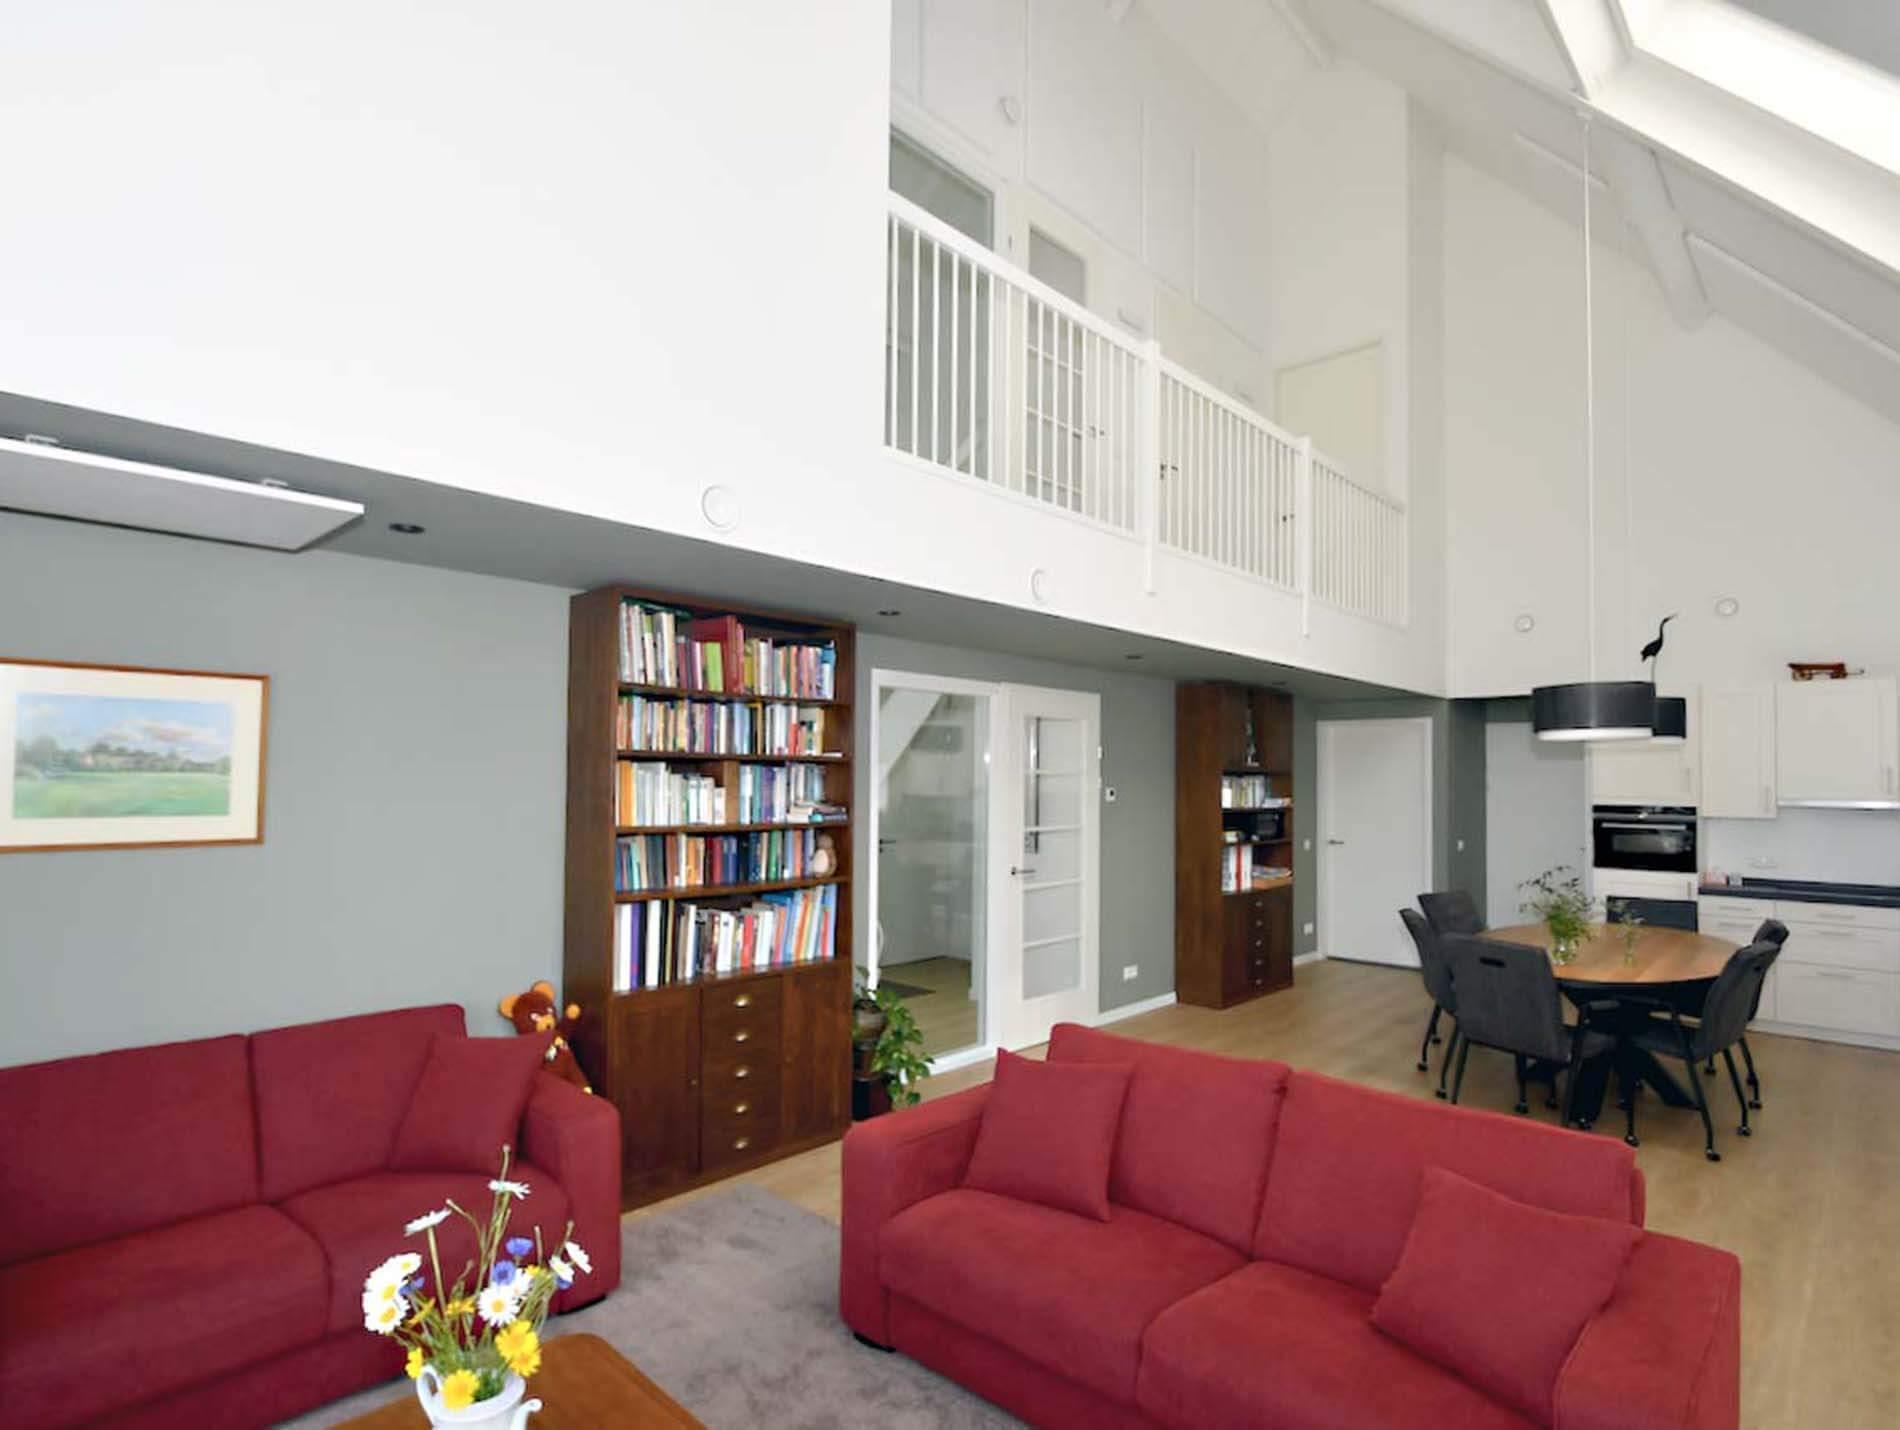 8. Wijnjewoude-particuliere-woning-interieur-1900x1430p.jpg